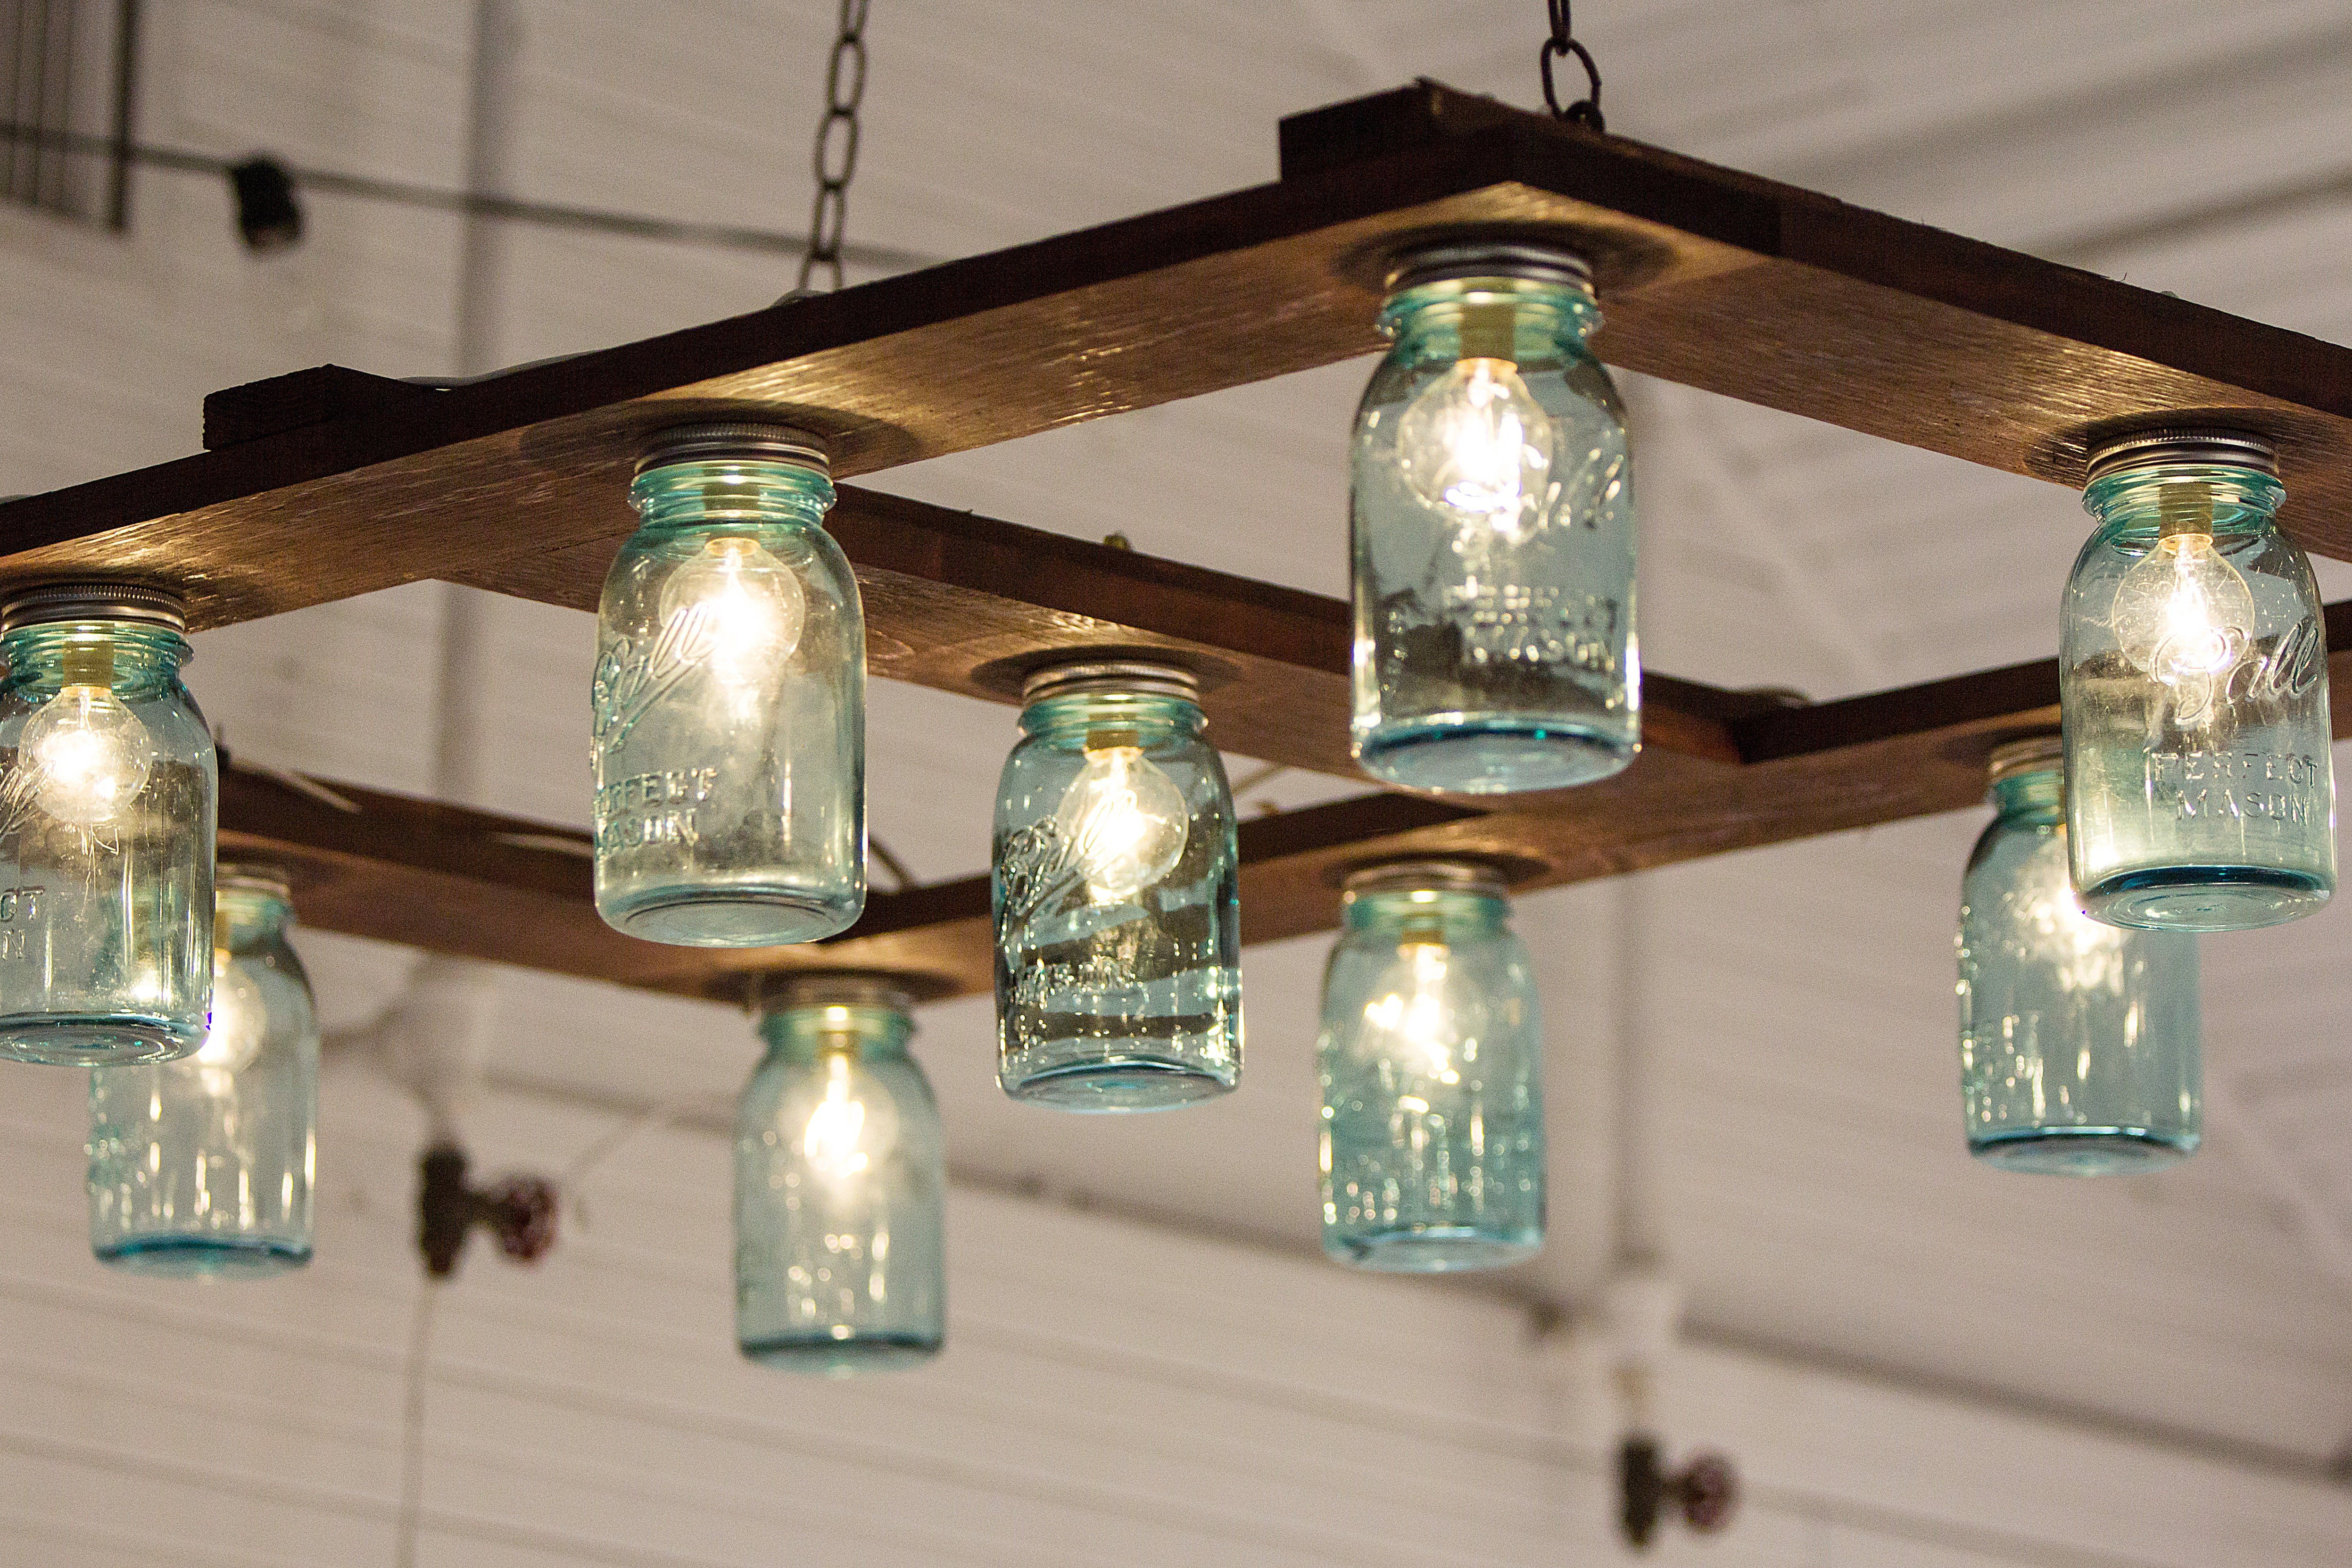 Hanging Mason Jar Light Out Of Mason Jars Cafe Lights And A Wood